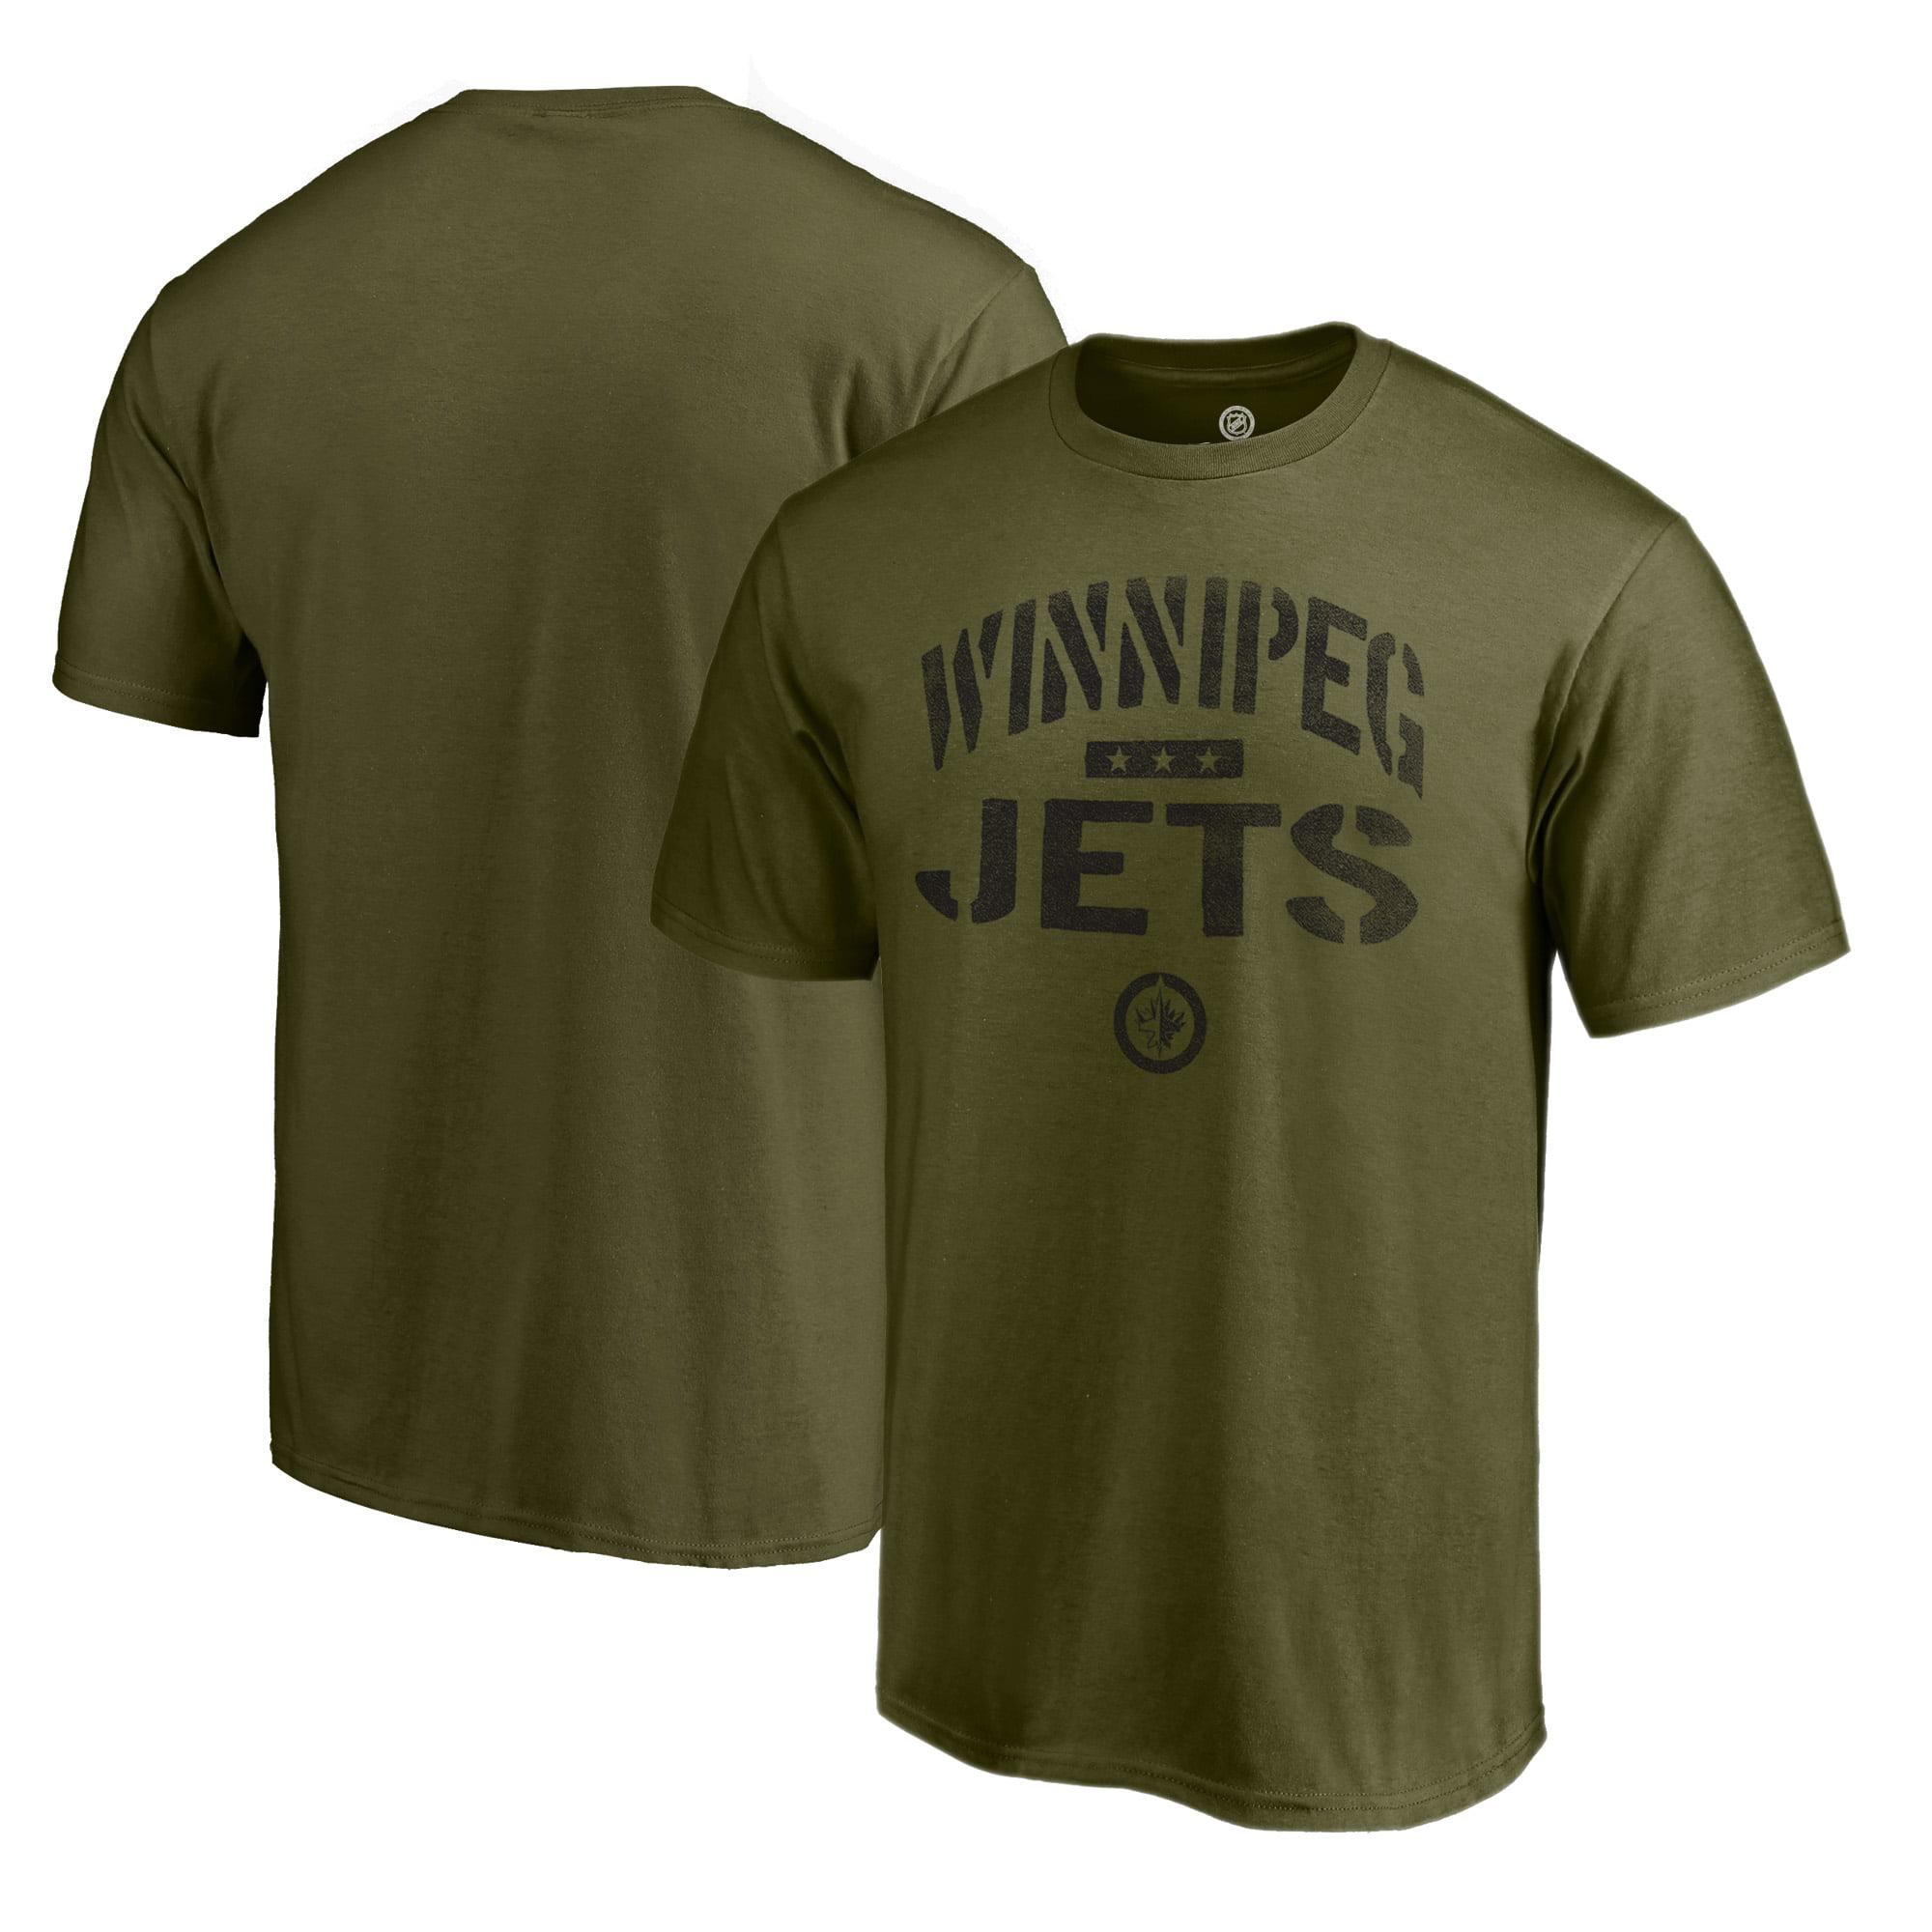 Winnipeg Jets Fanatics Branded Camo Collection Jungle T-Shirt - Green